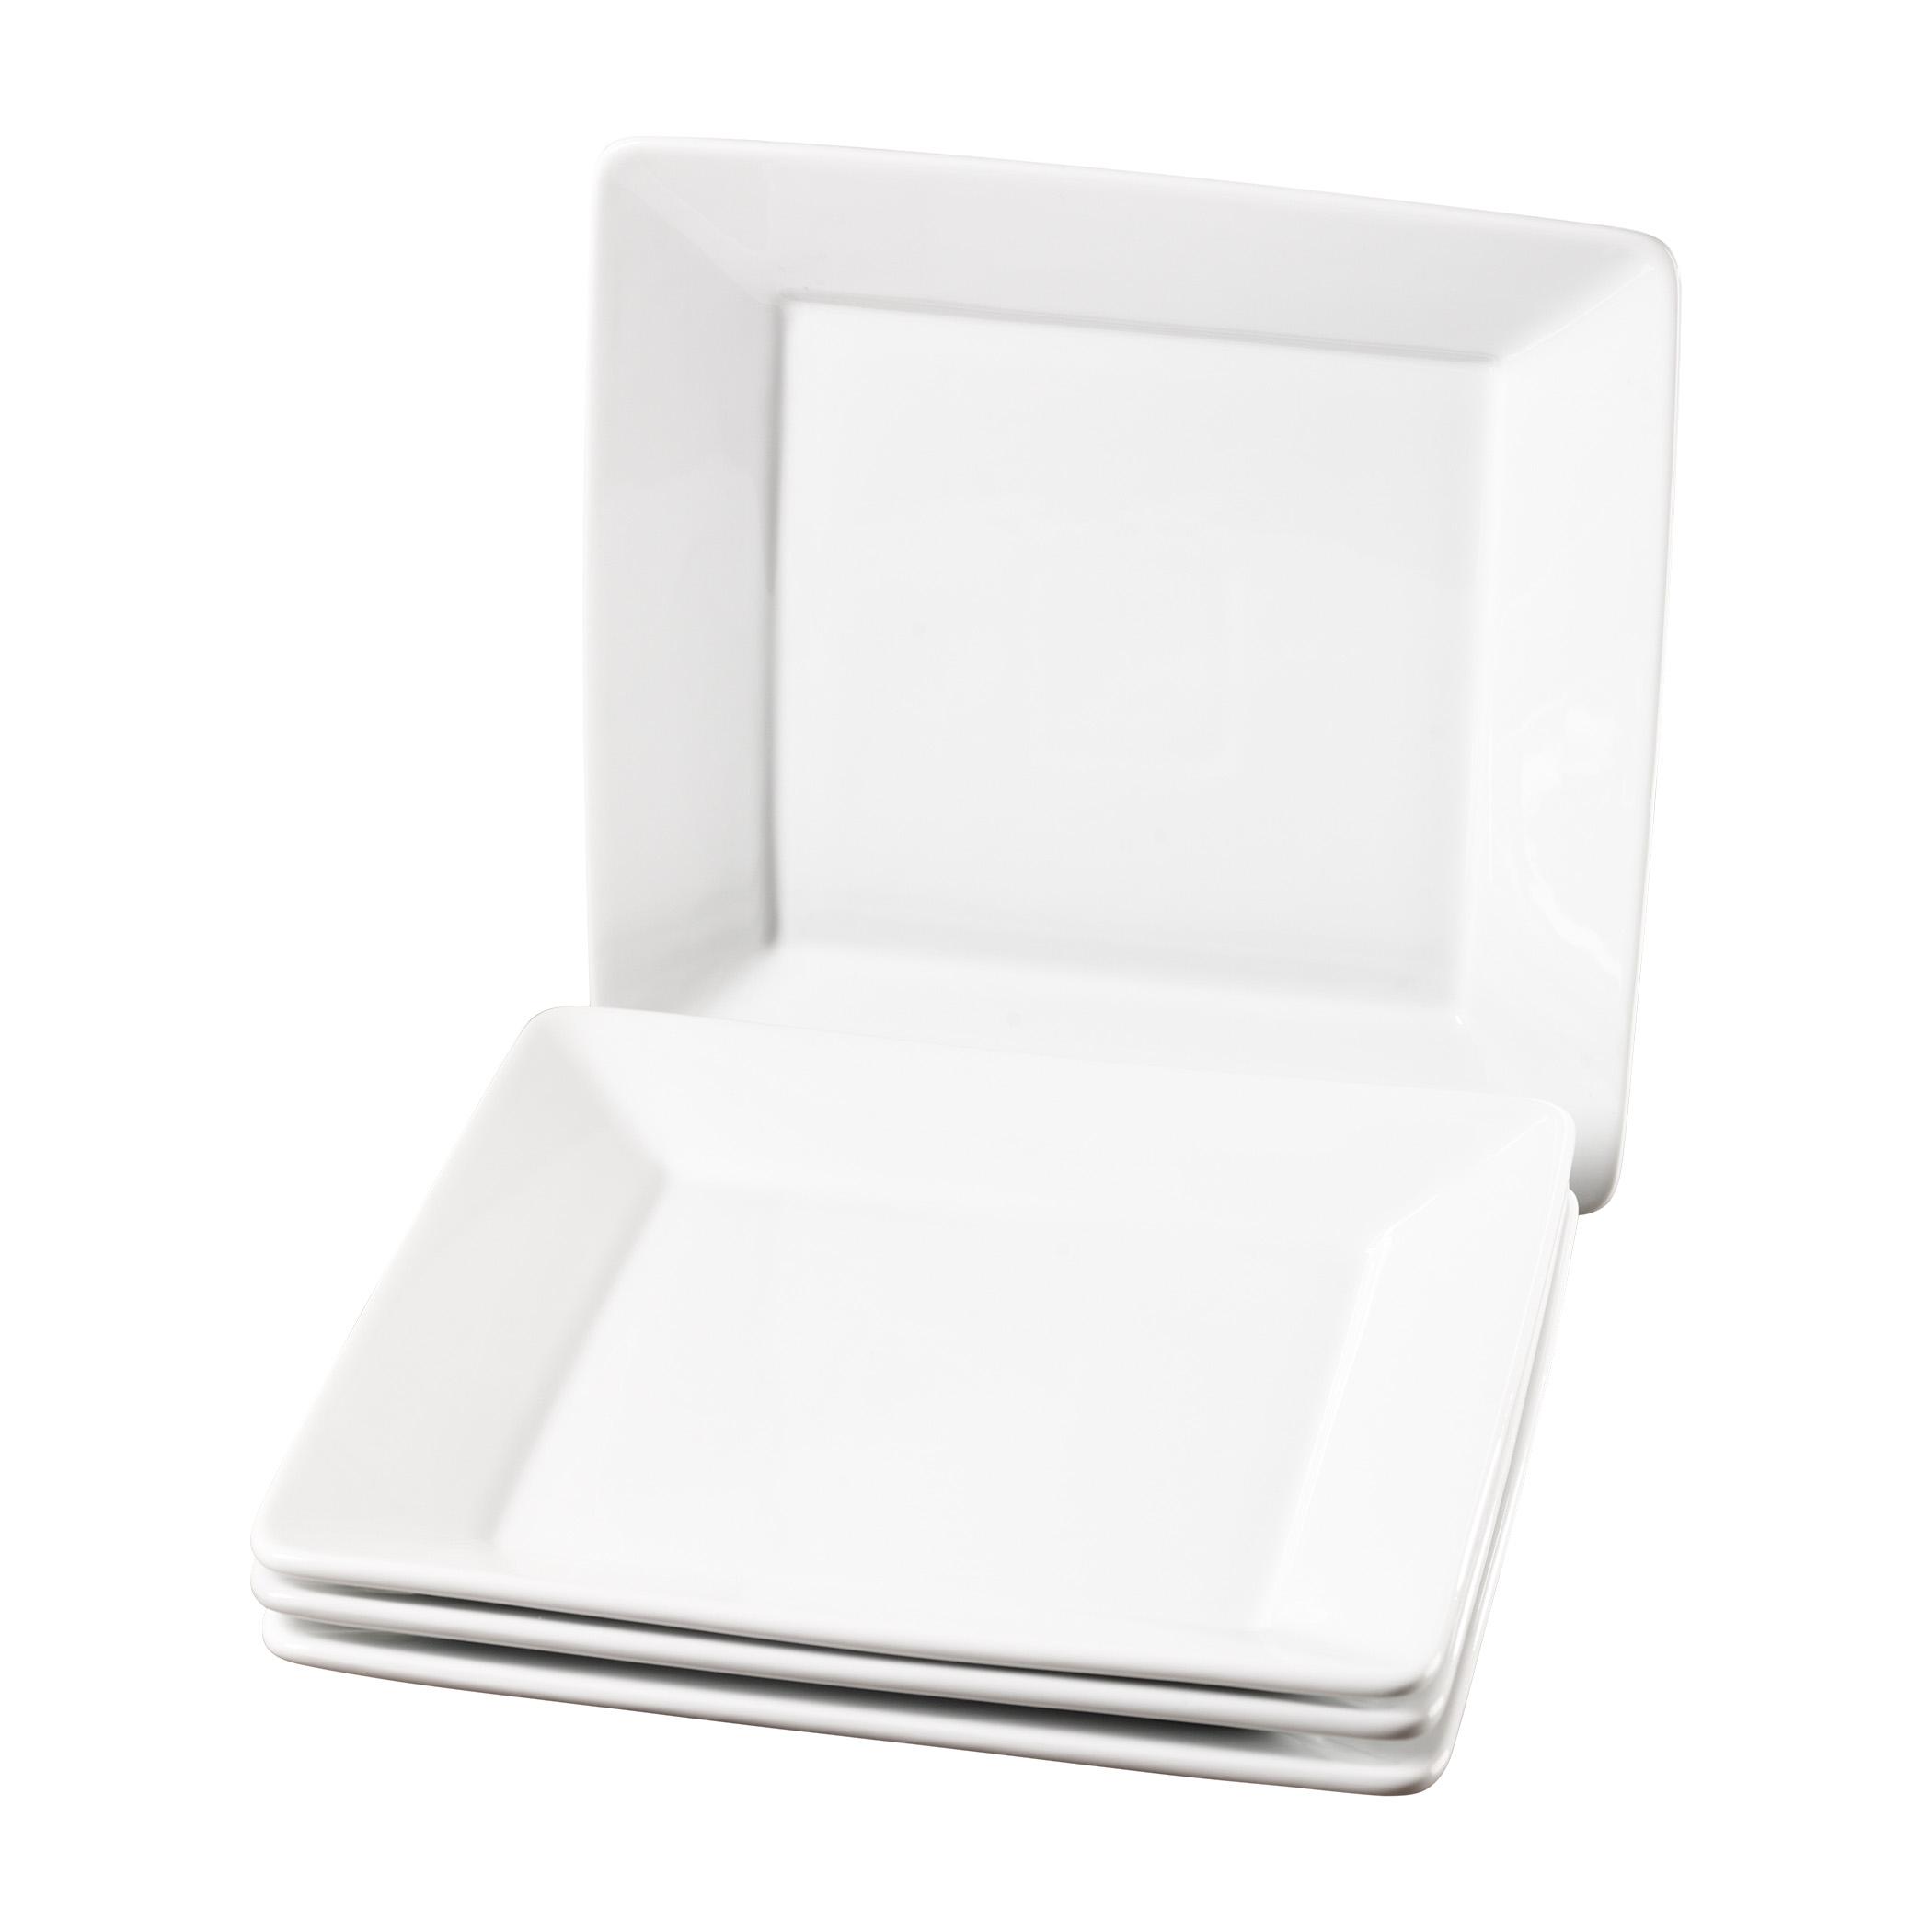 TTU-Q1211-EC-Set of Four 10.5 Inch Porcelain Dinner Plates by Denmark  sc 1 st  Tabletops Unlimited & Set of Four 10.5 Inch Square Porcelain Dinner Plates by Denmark ...